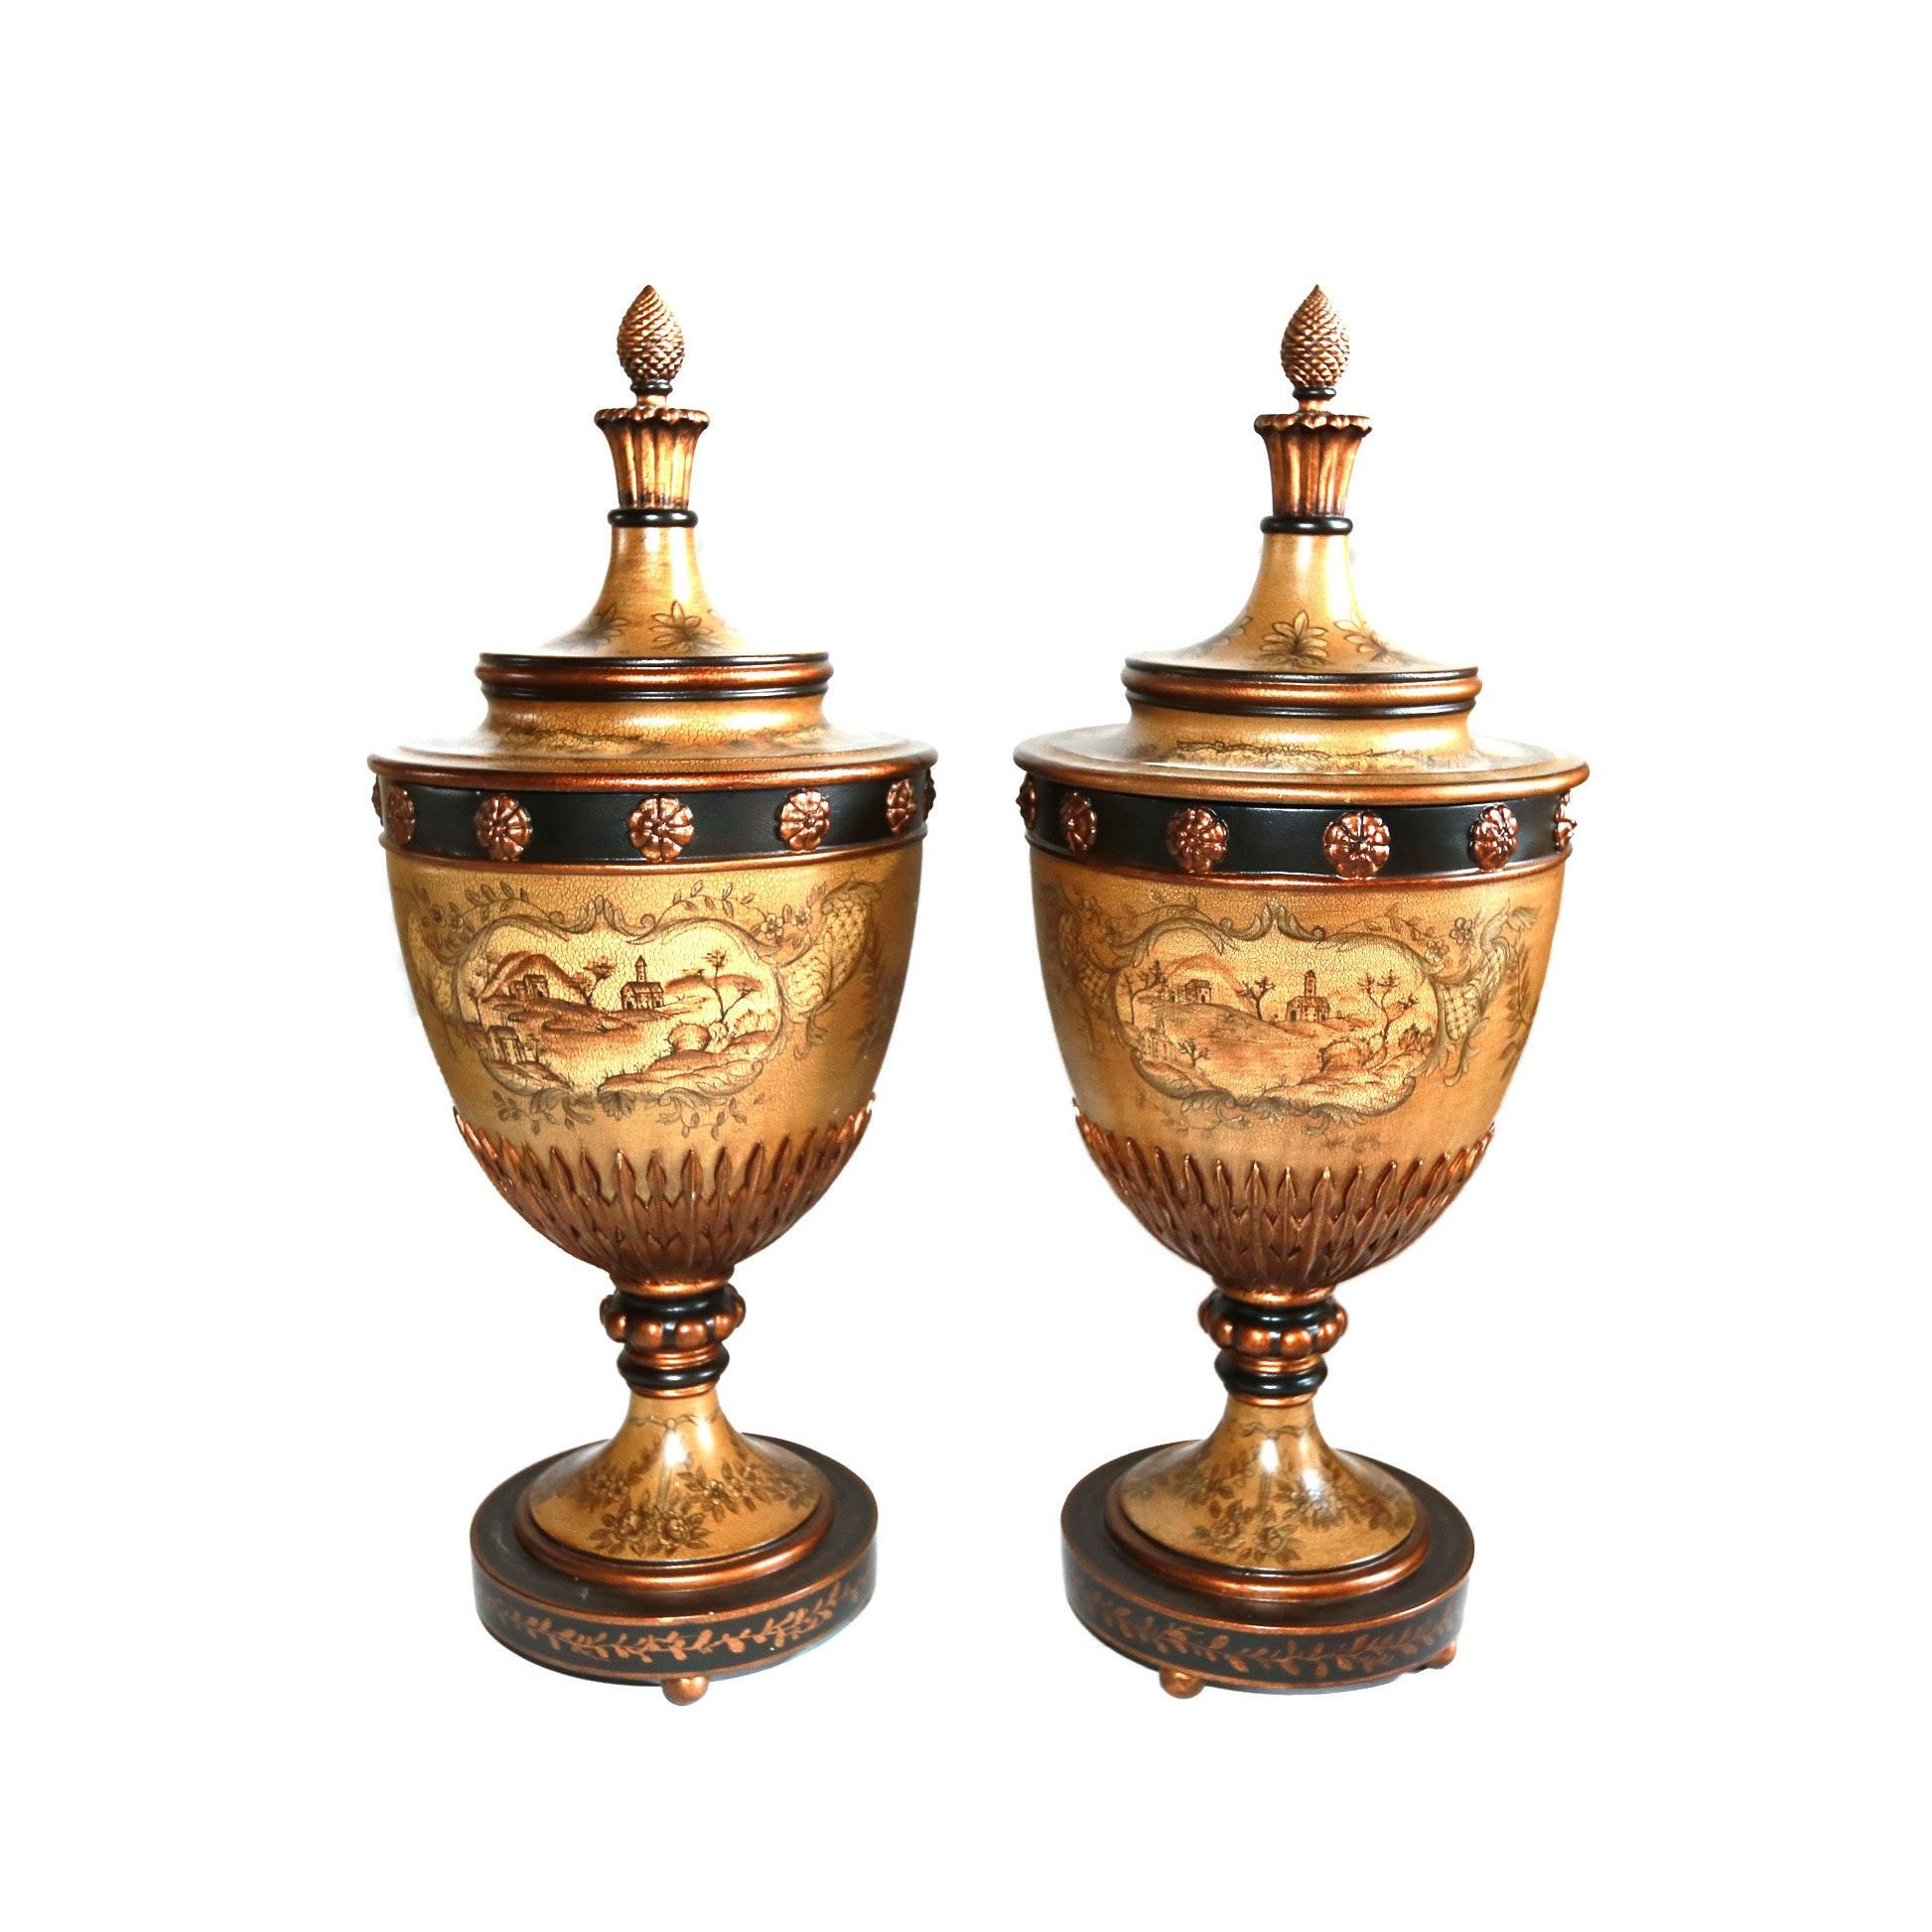 Pair of Large Painted Urn Style Jars